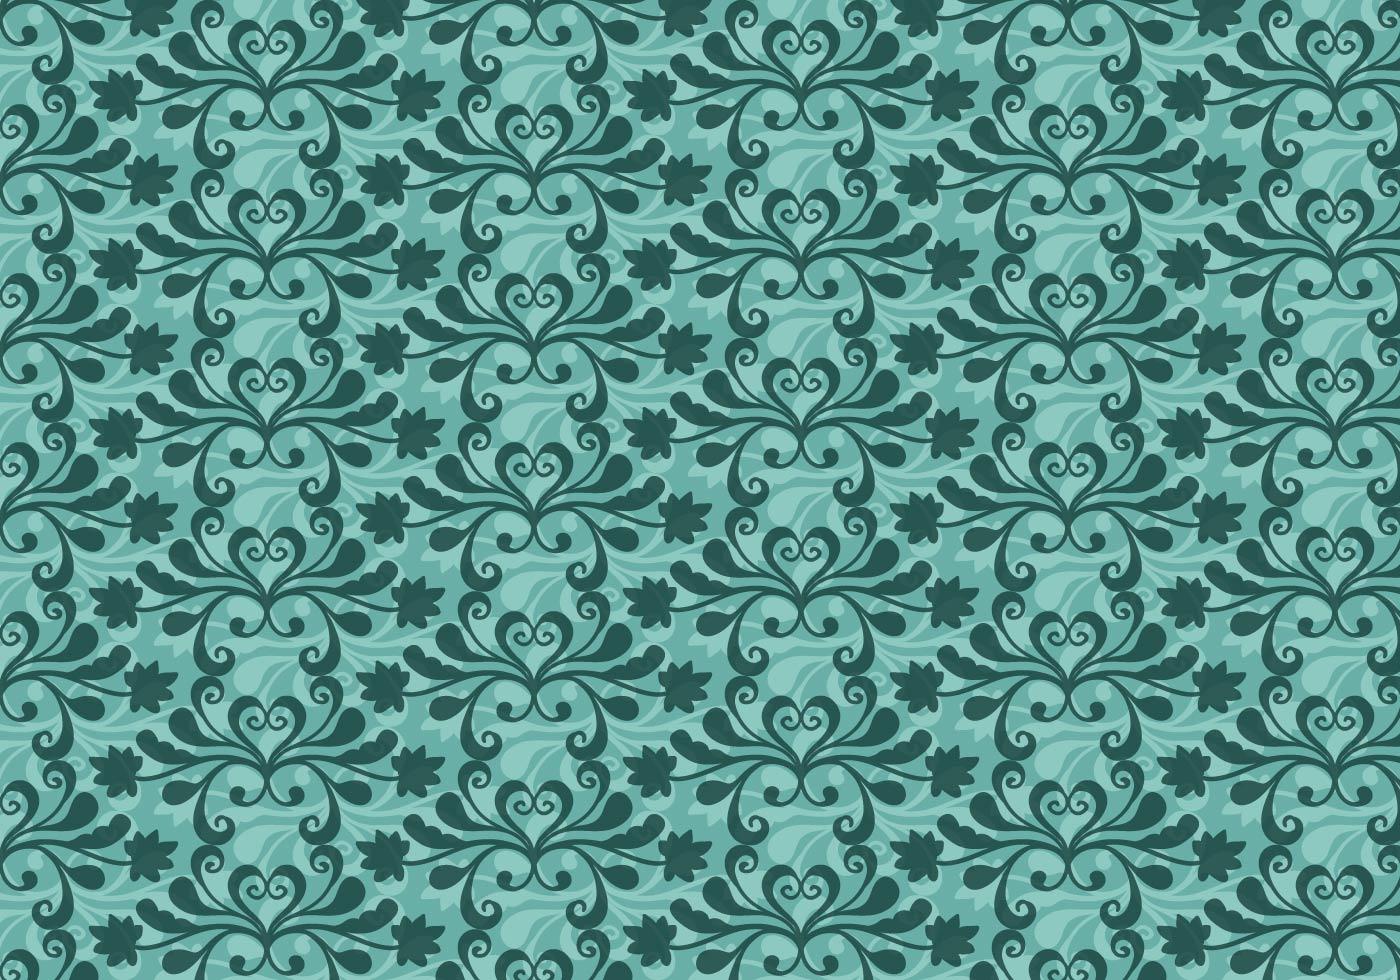 Free Vector Teal Western Flourish Pattern Download Free